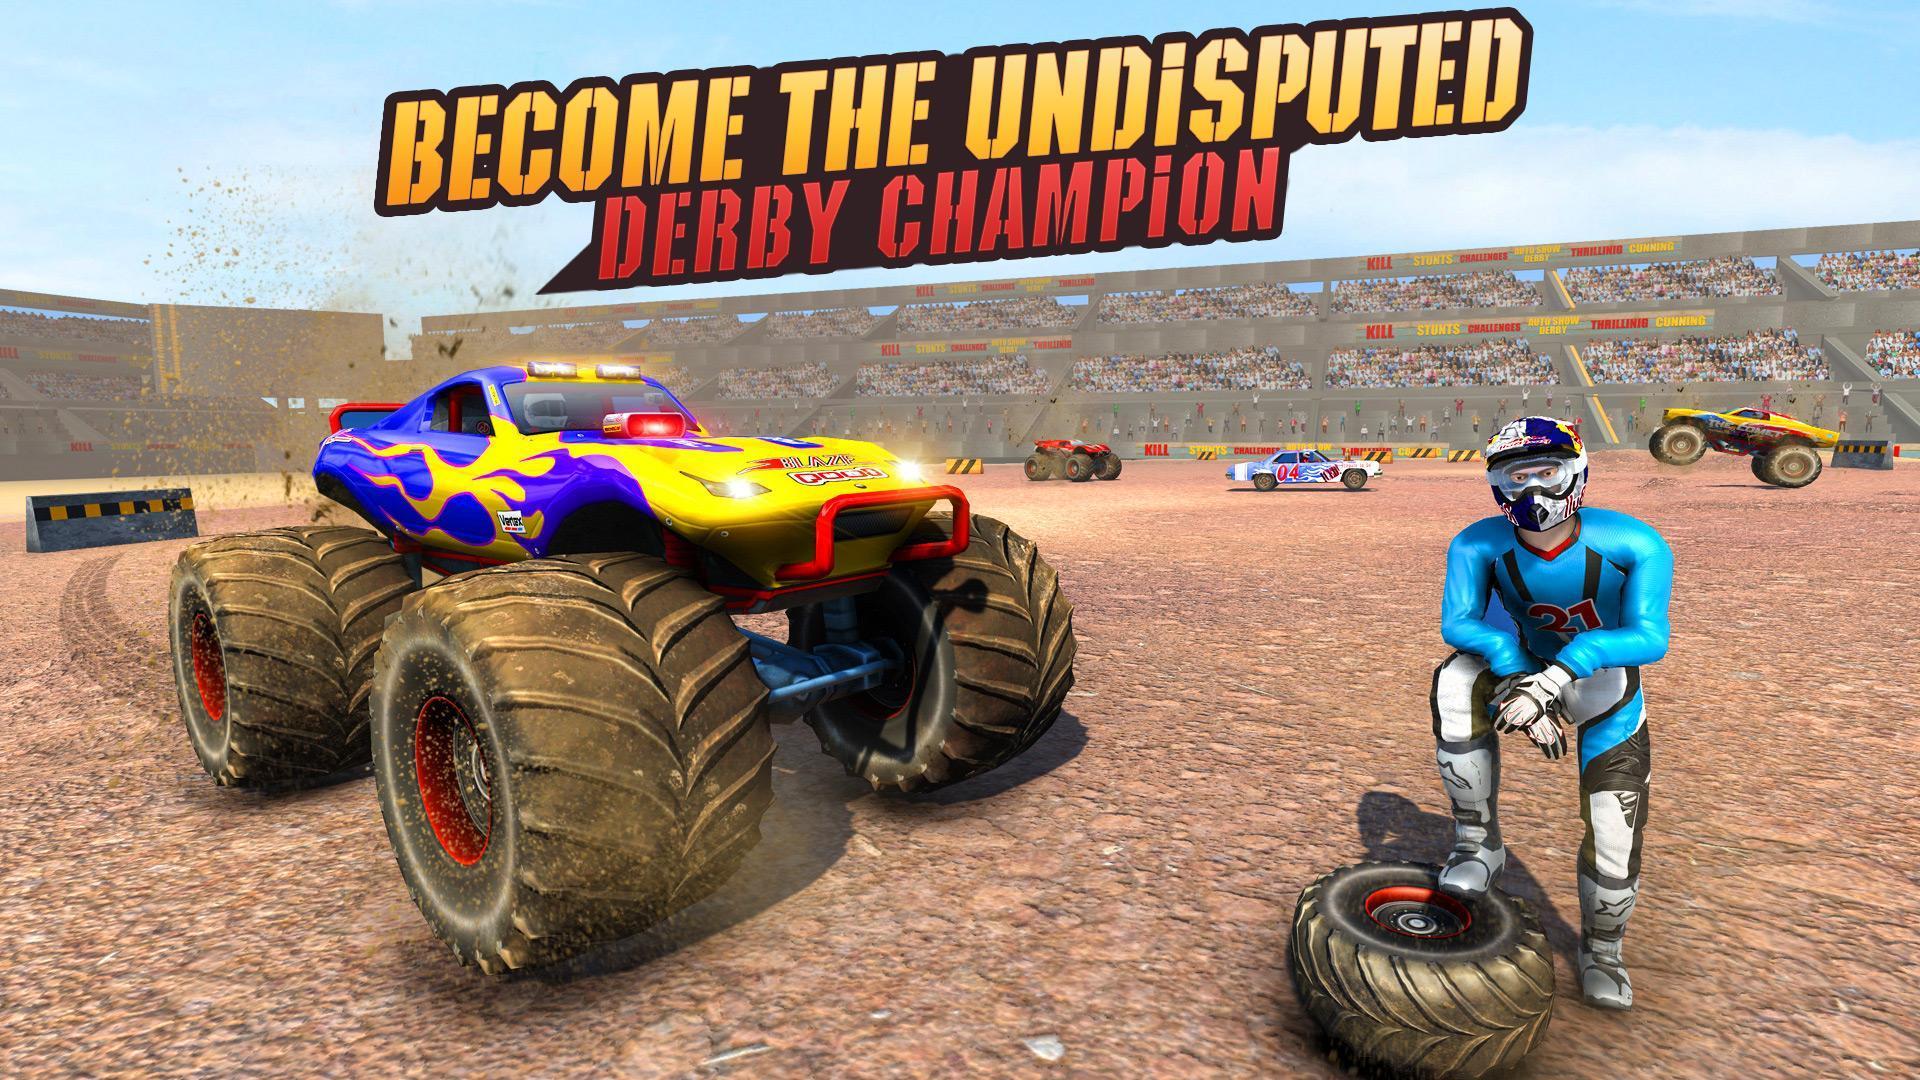 Real Monster Truck Demolition Derby Crash Stunts 3.0.3 Screenshot 9